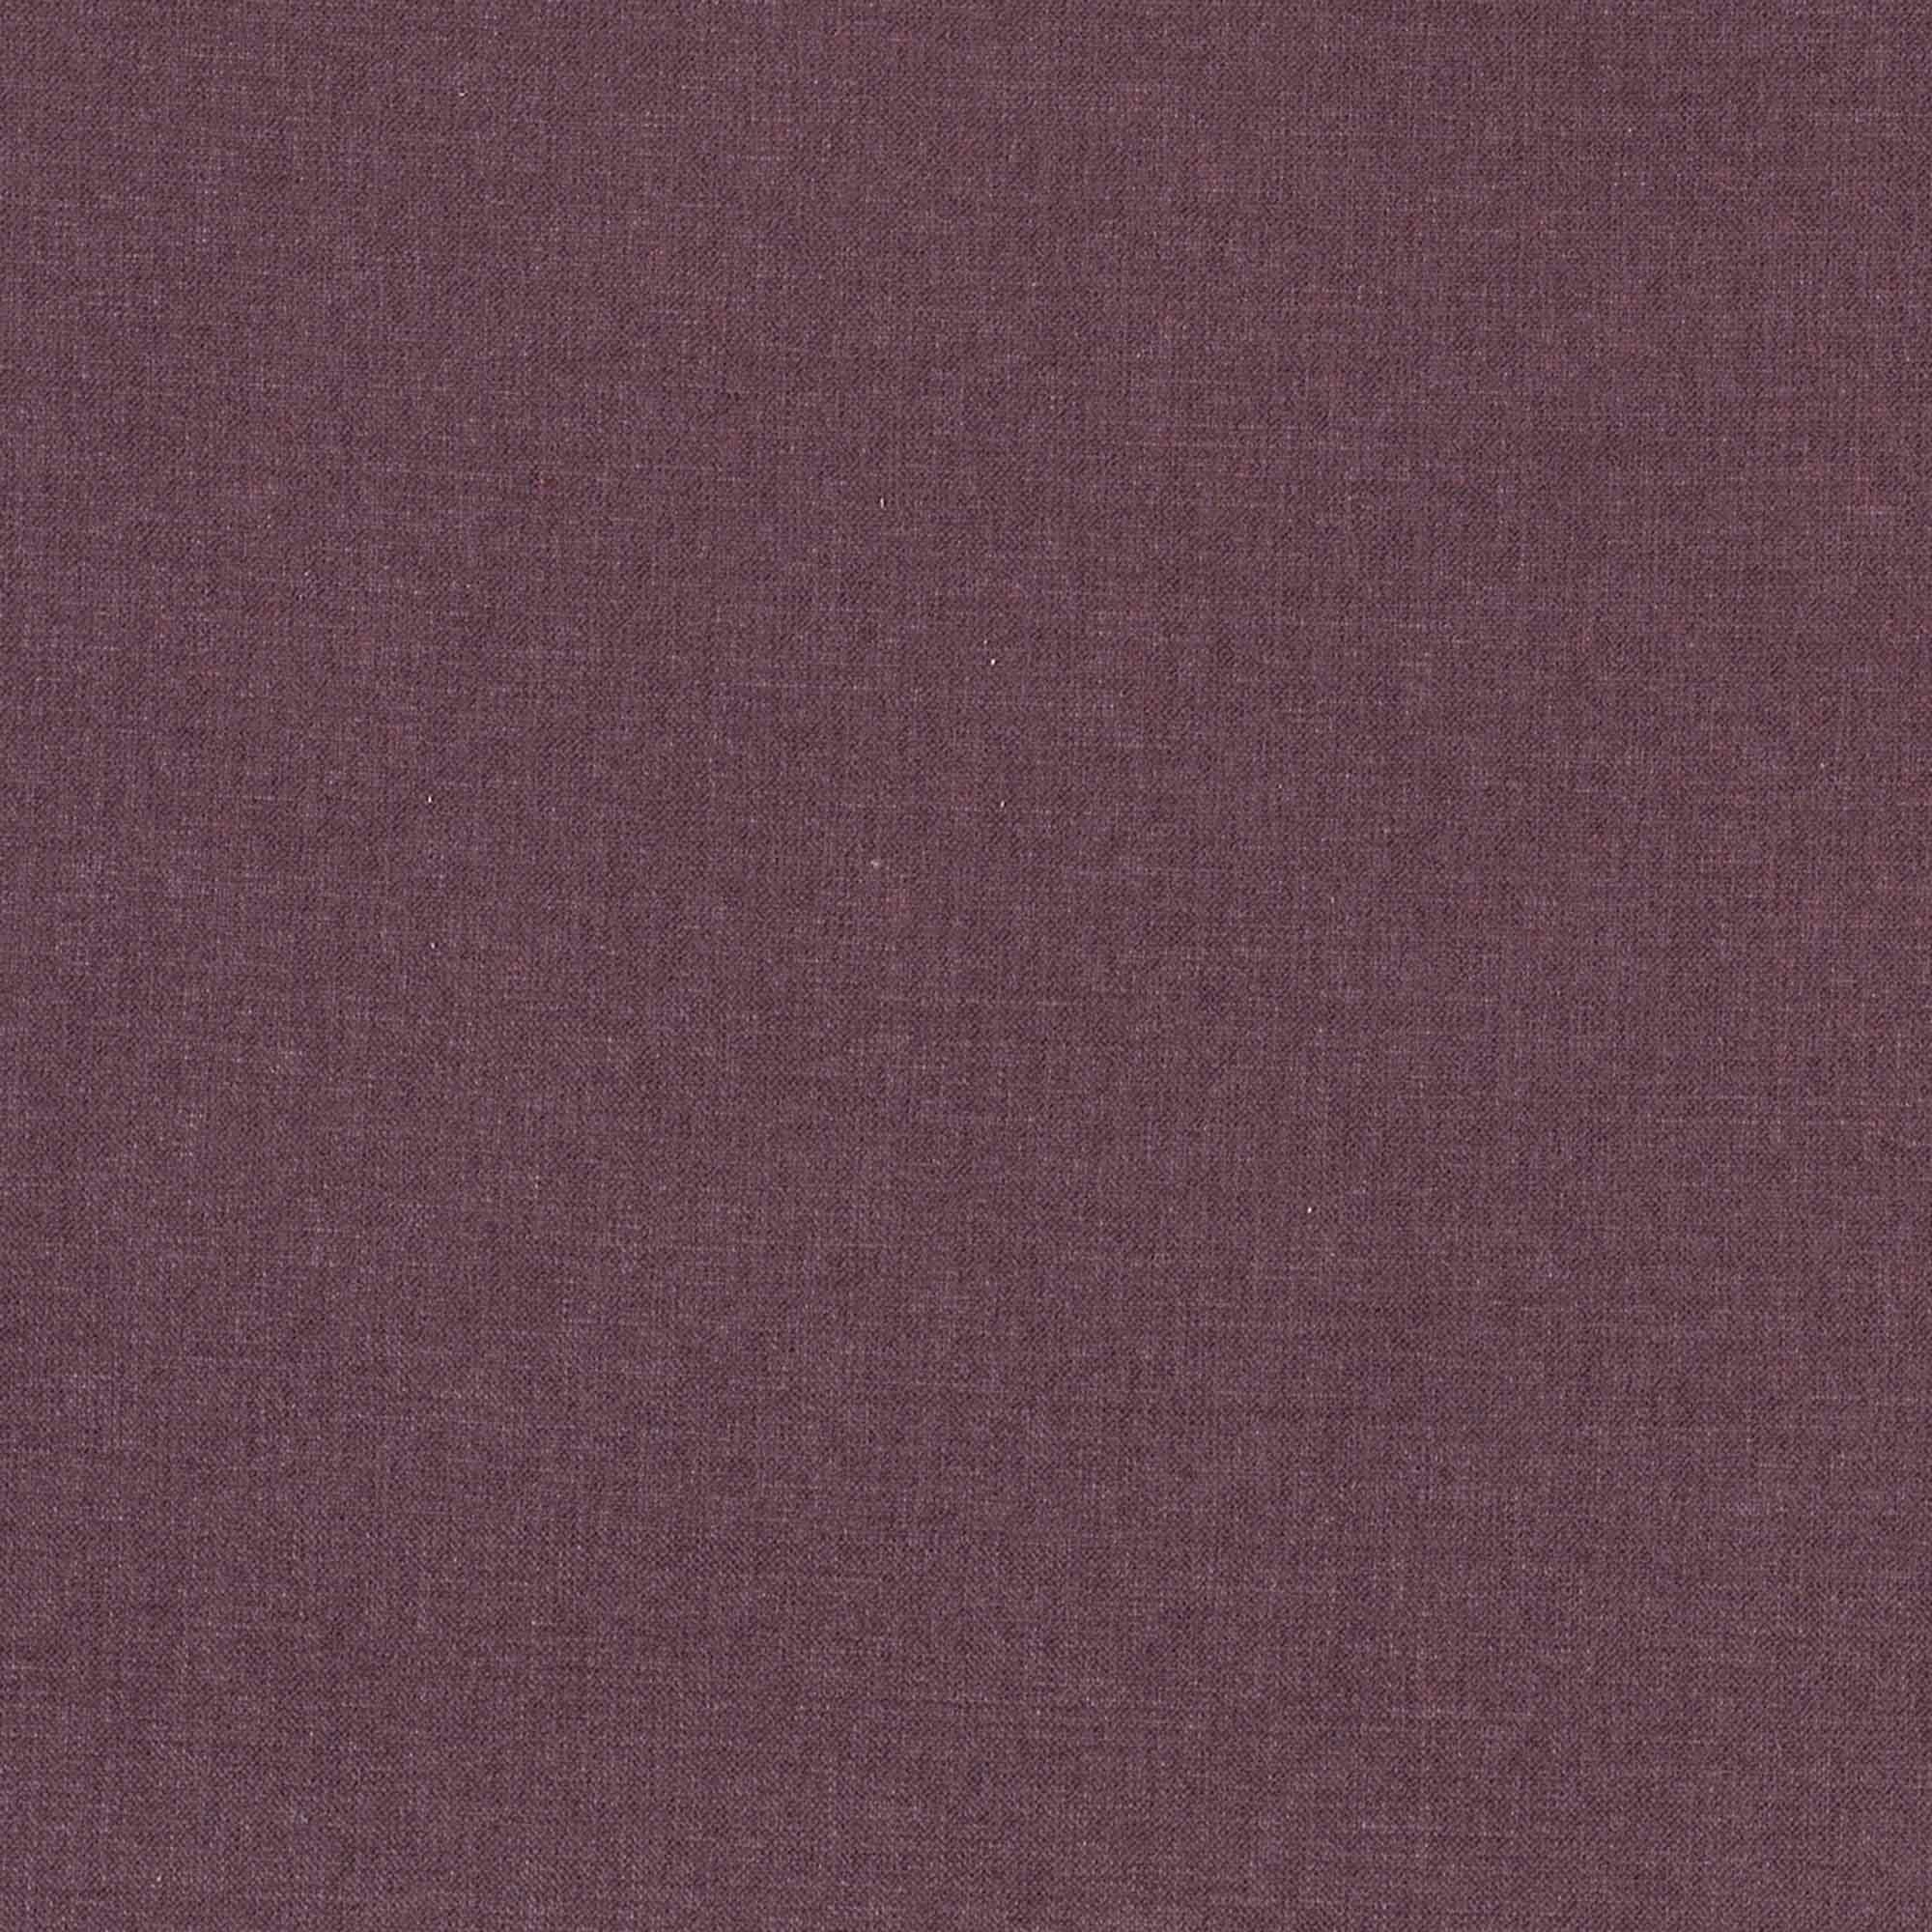 Livorno Fabric Sample